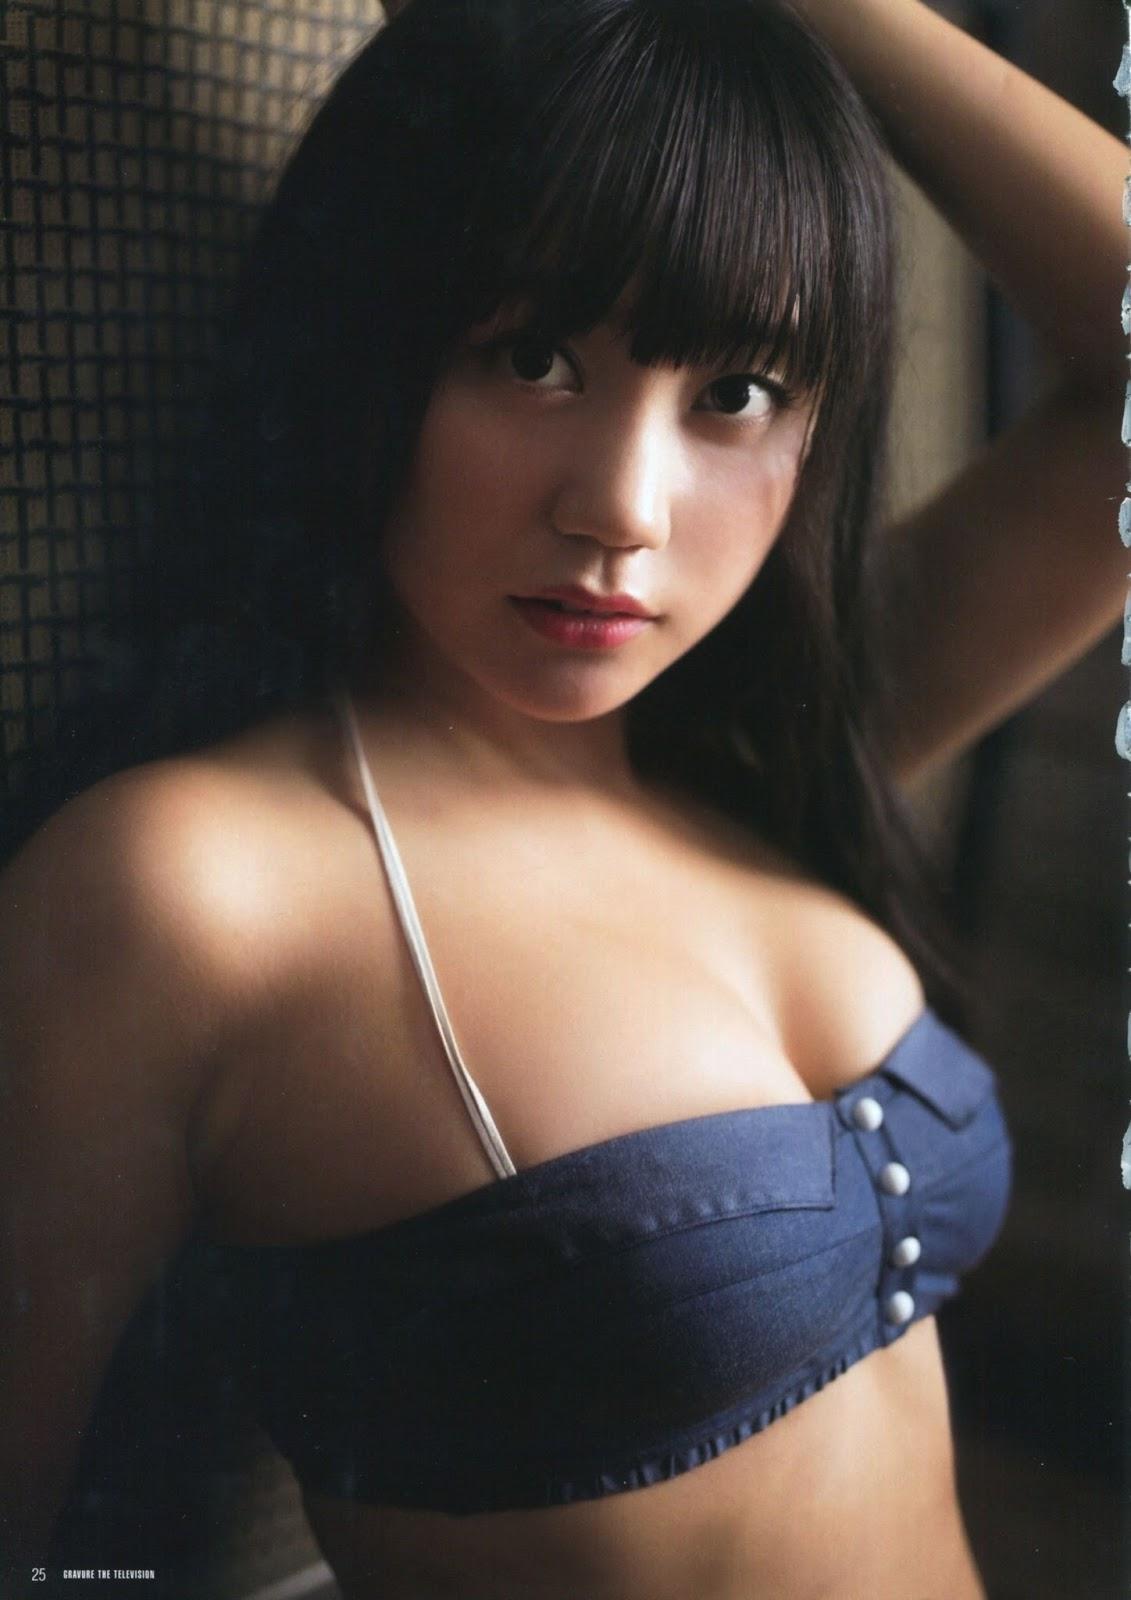 Yabushita Shu 薮下柊, Gravure The Television 2017 Vol.48 (G(グラビア)ザテレビジョン) Vol.84)